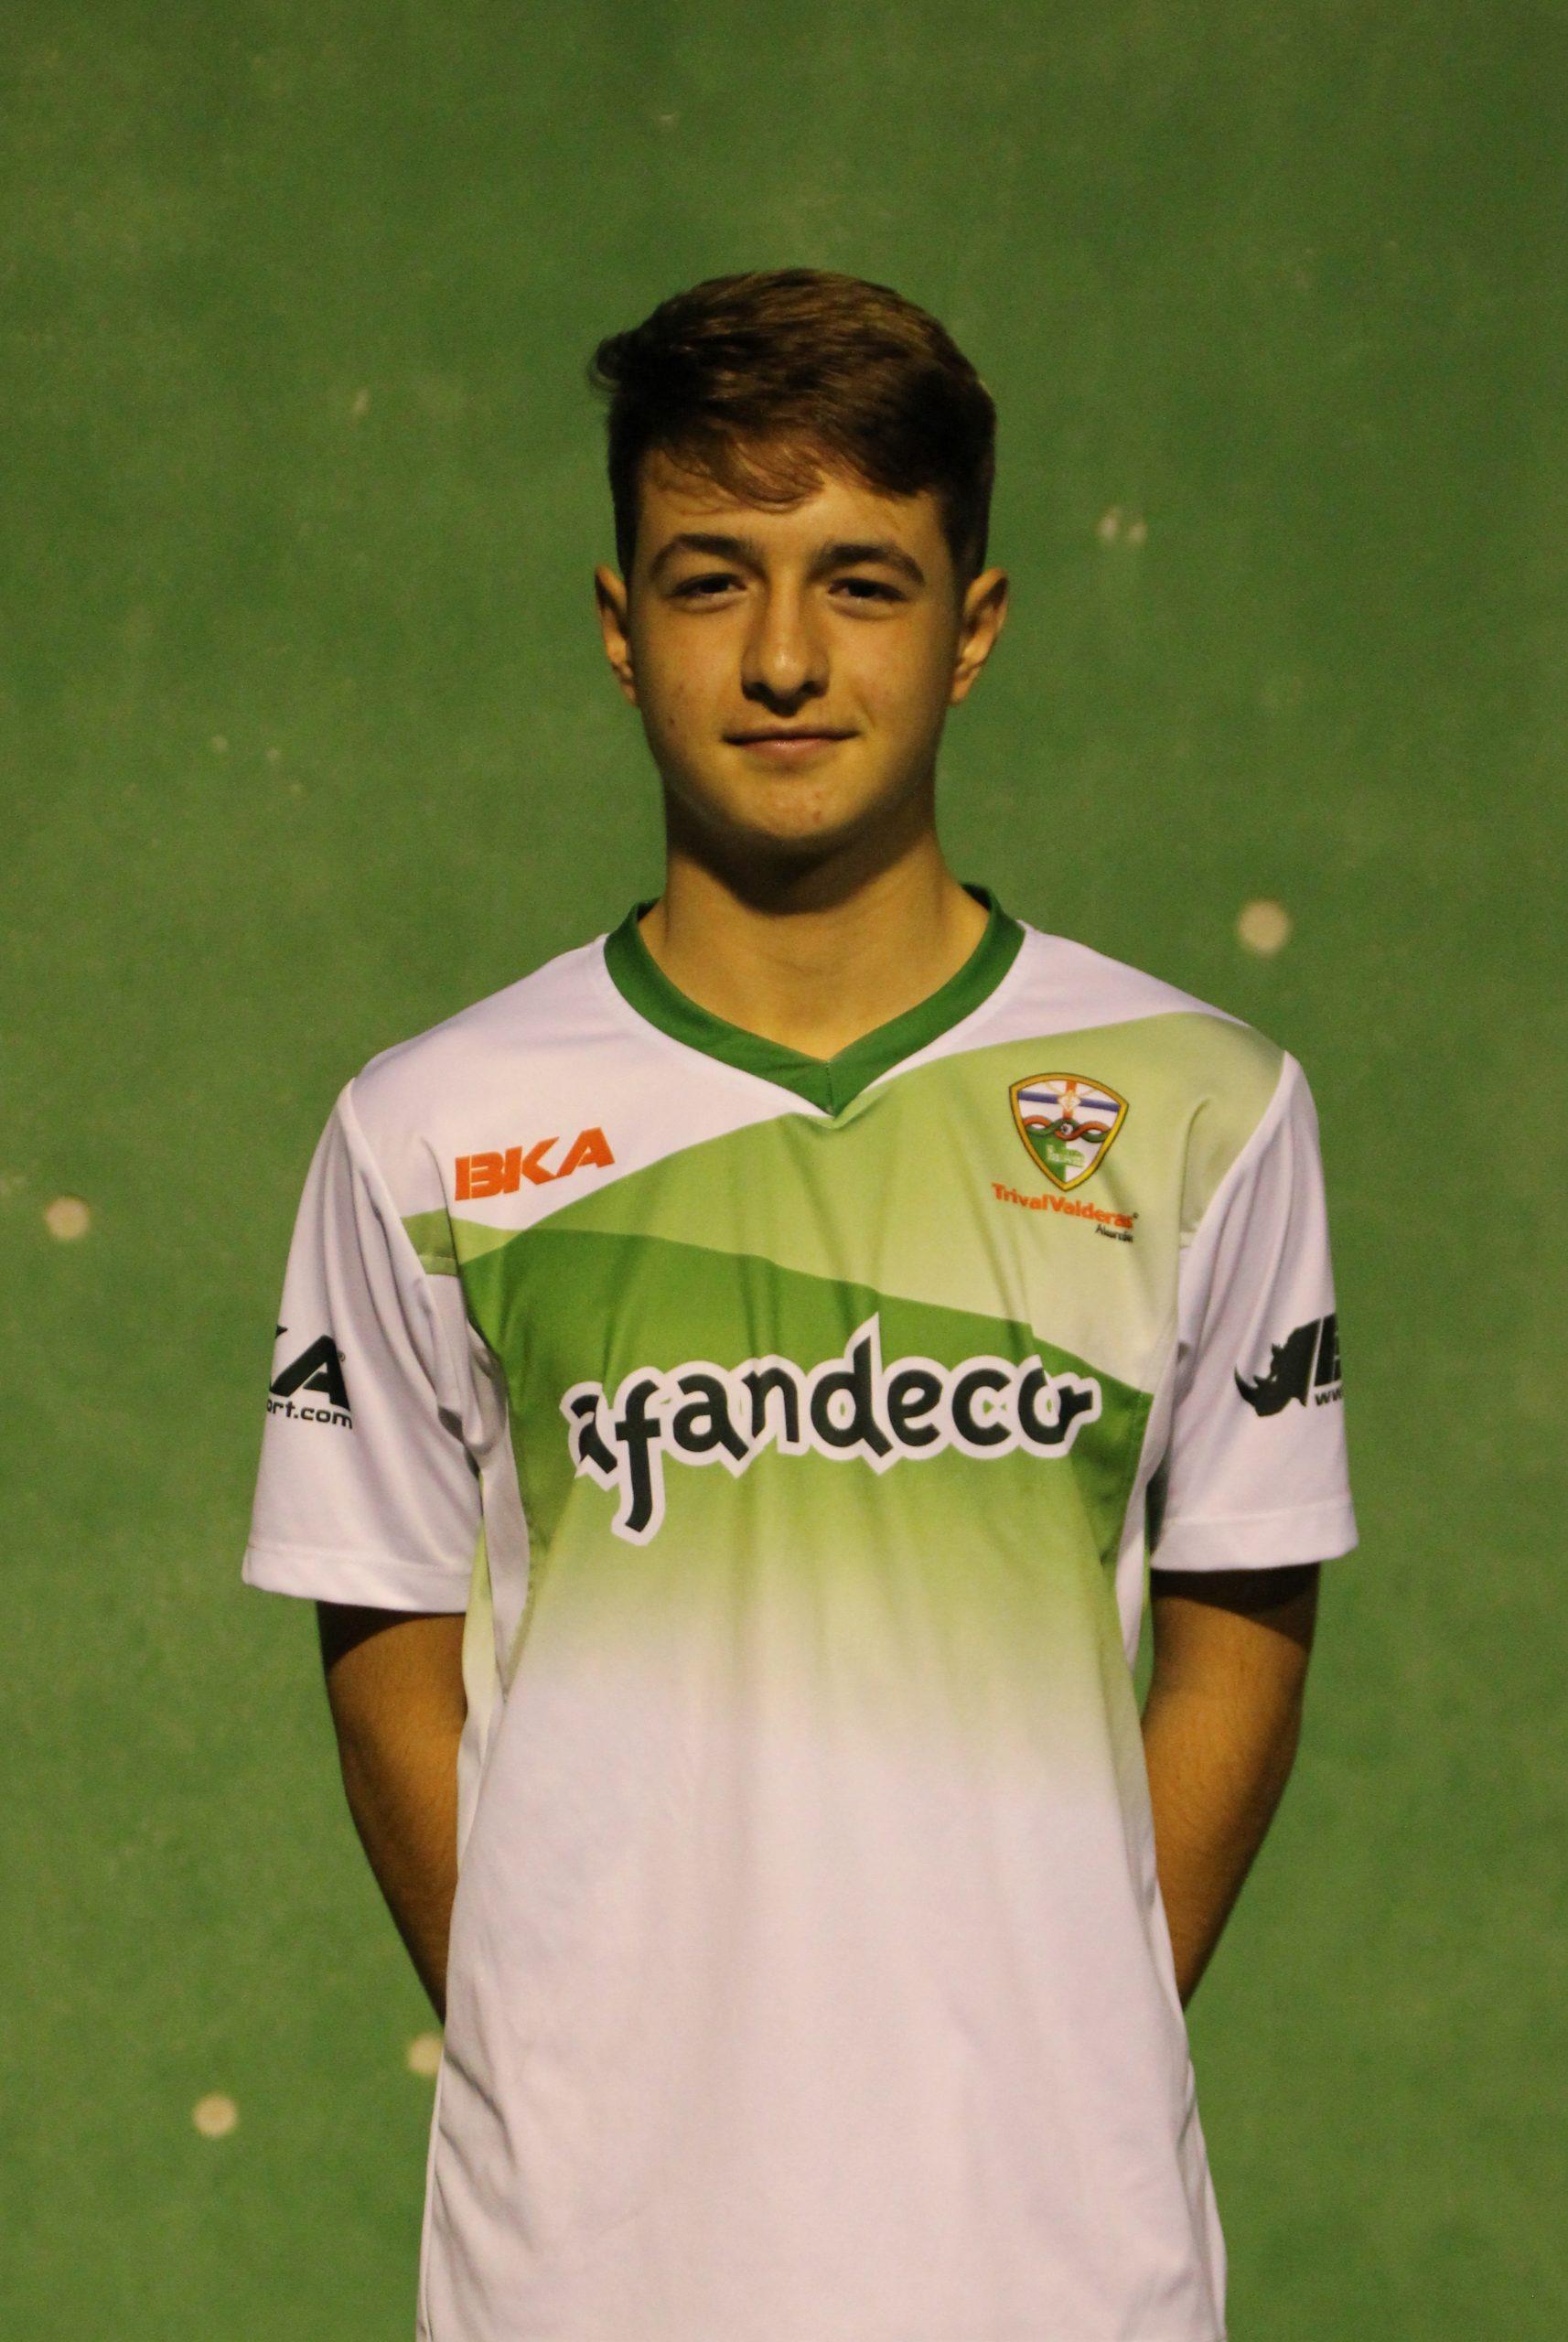 1 Sergio Sánchez Navarro